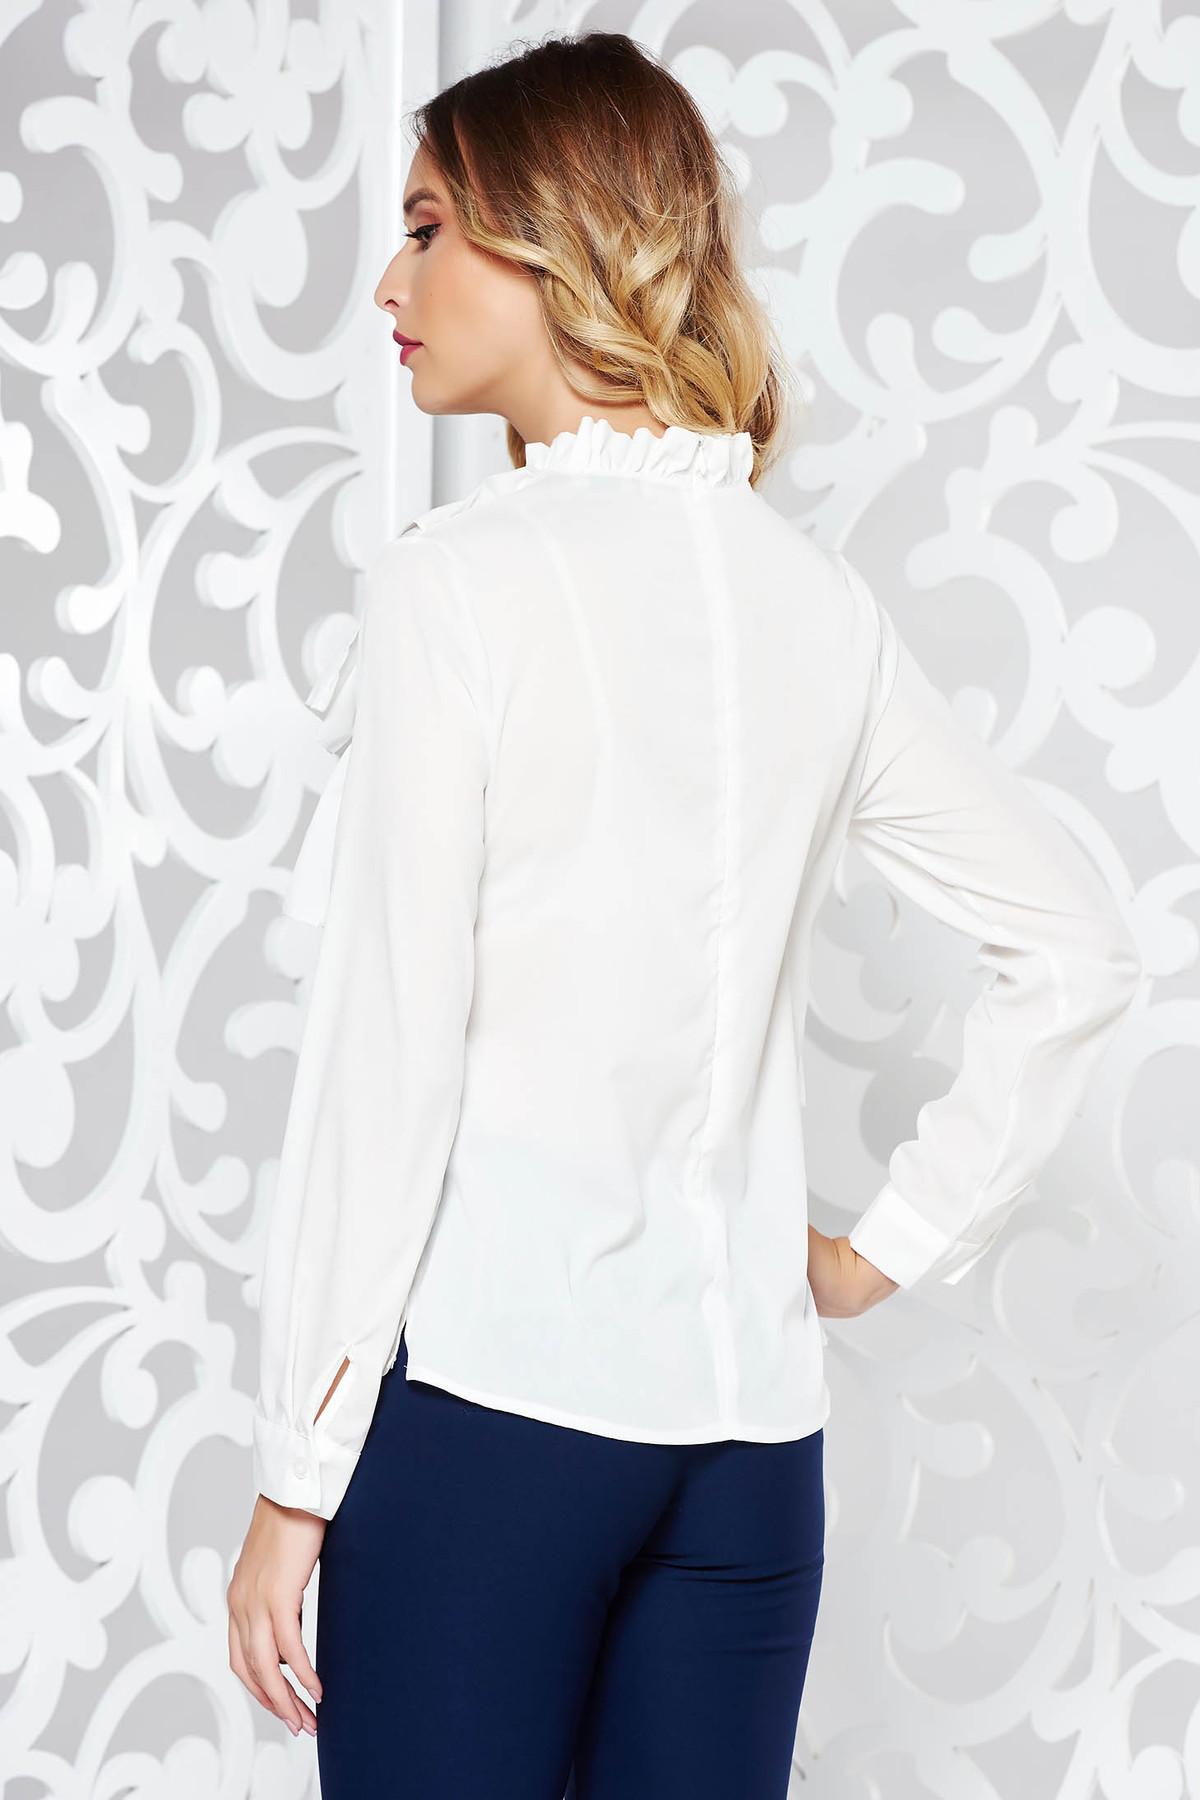 Camasa dama alba eleganta cu croi larg din material usor transparent cu volanase accesorizata cu brosa